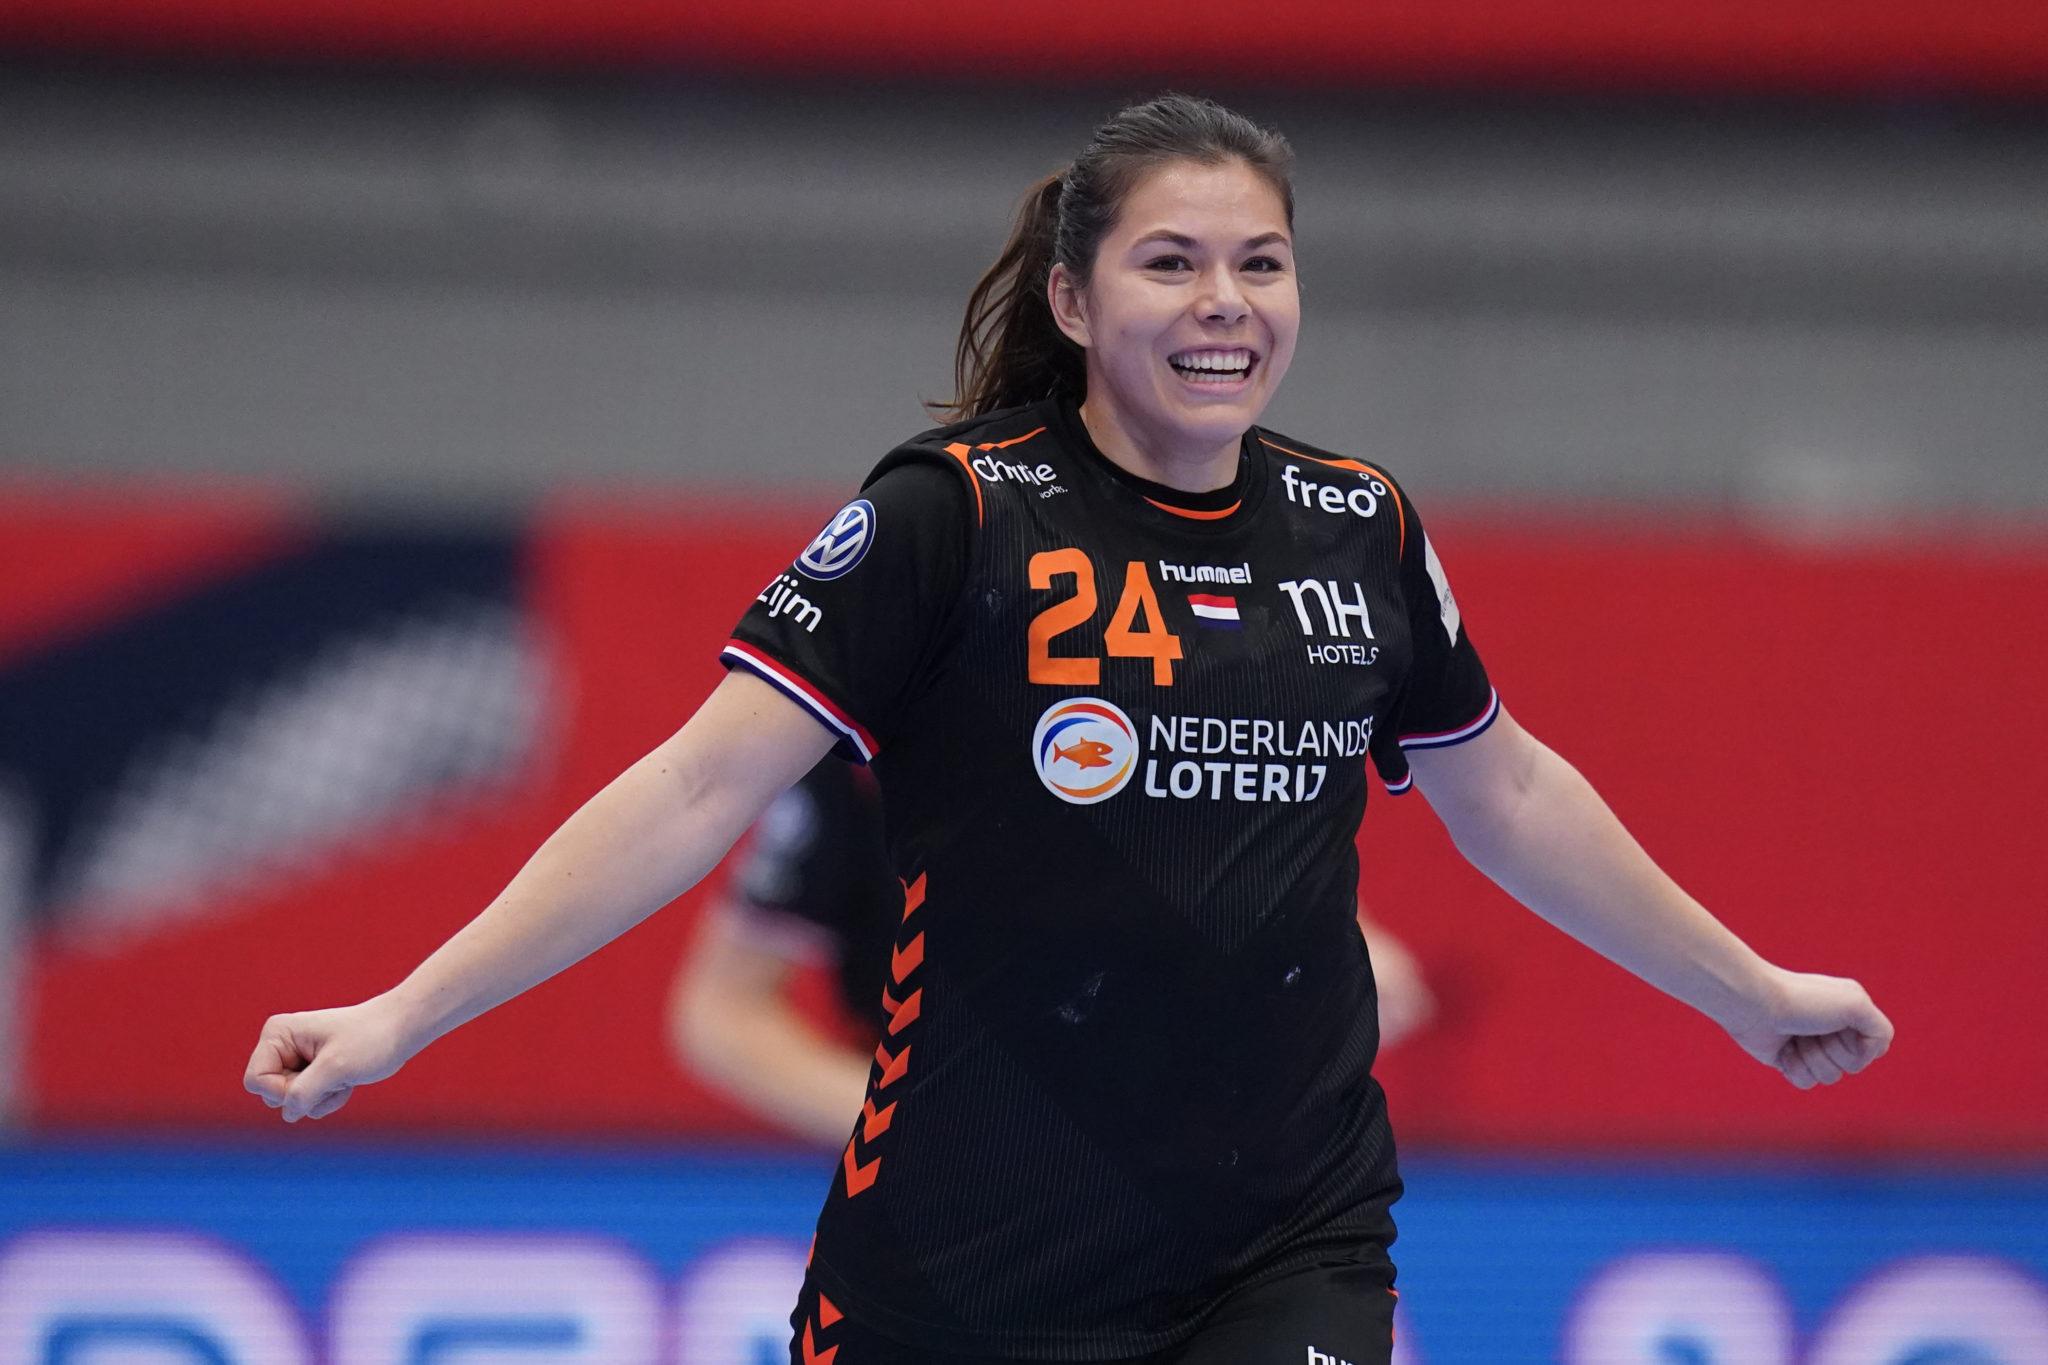 Handbalster Martine Smeets Beëindigt Haar Interlandcarrière